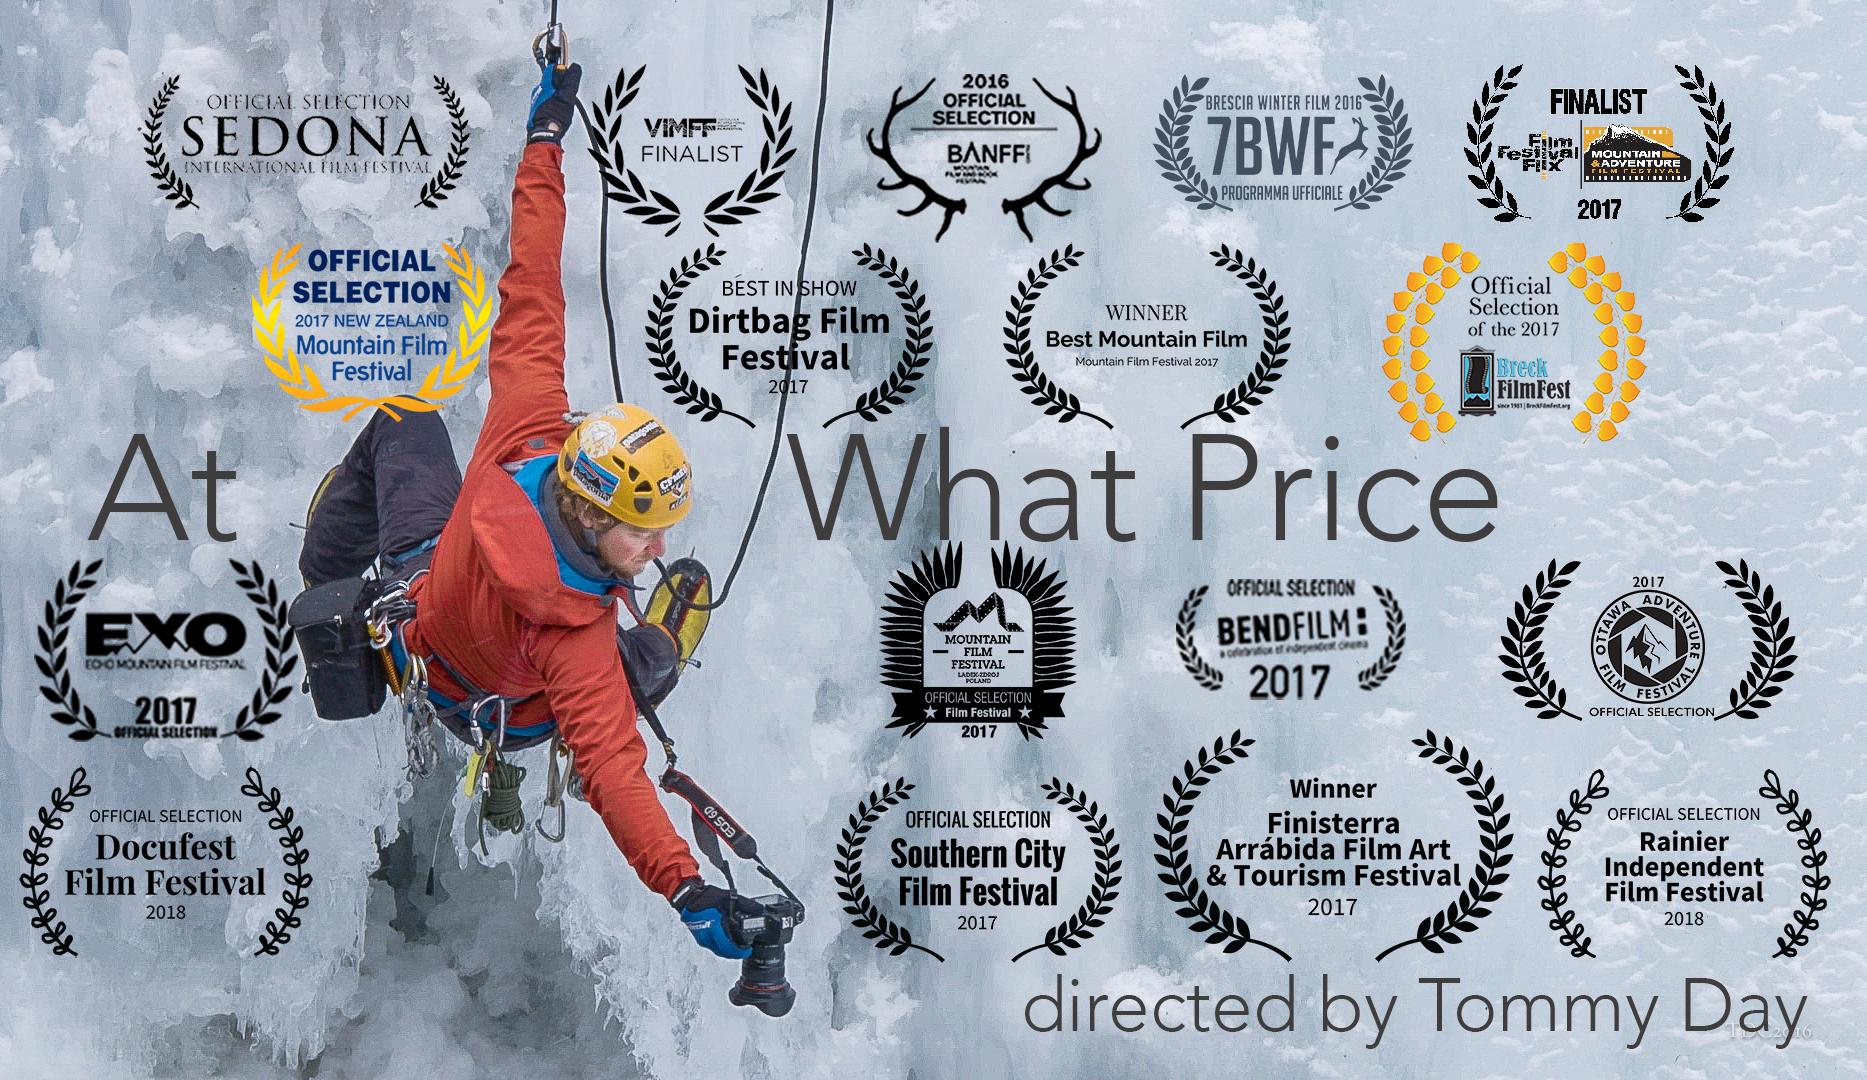 Banff Mountain Film Festival Finalist! World Premiere November 2016